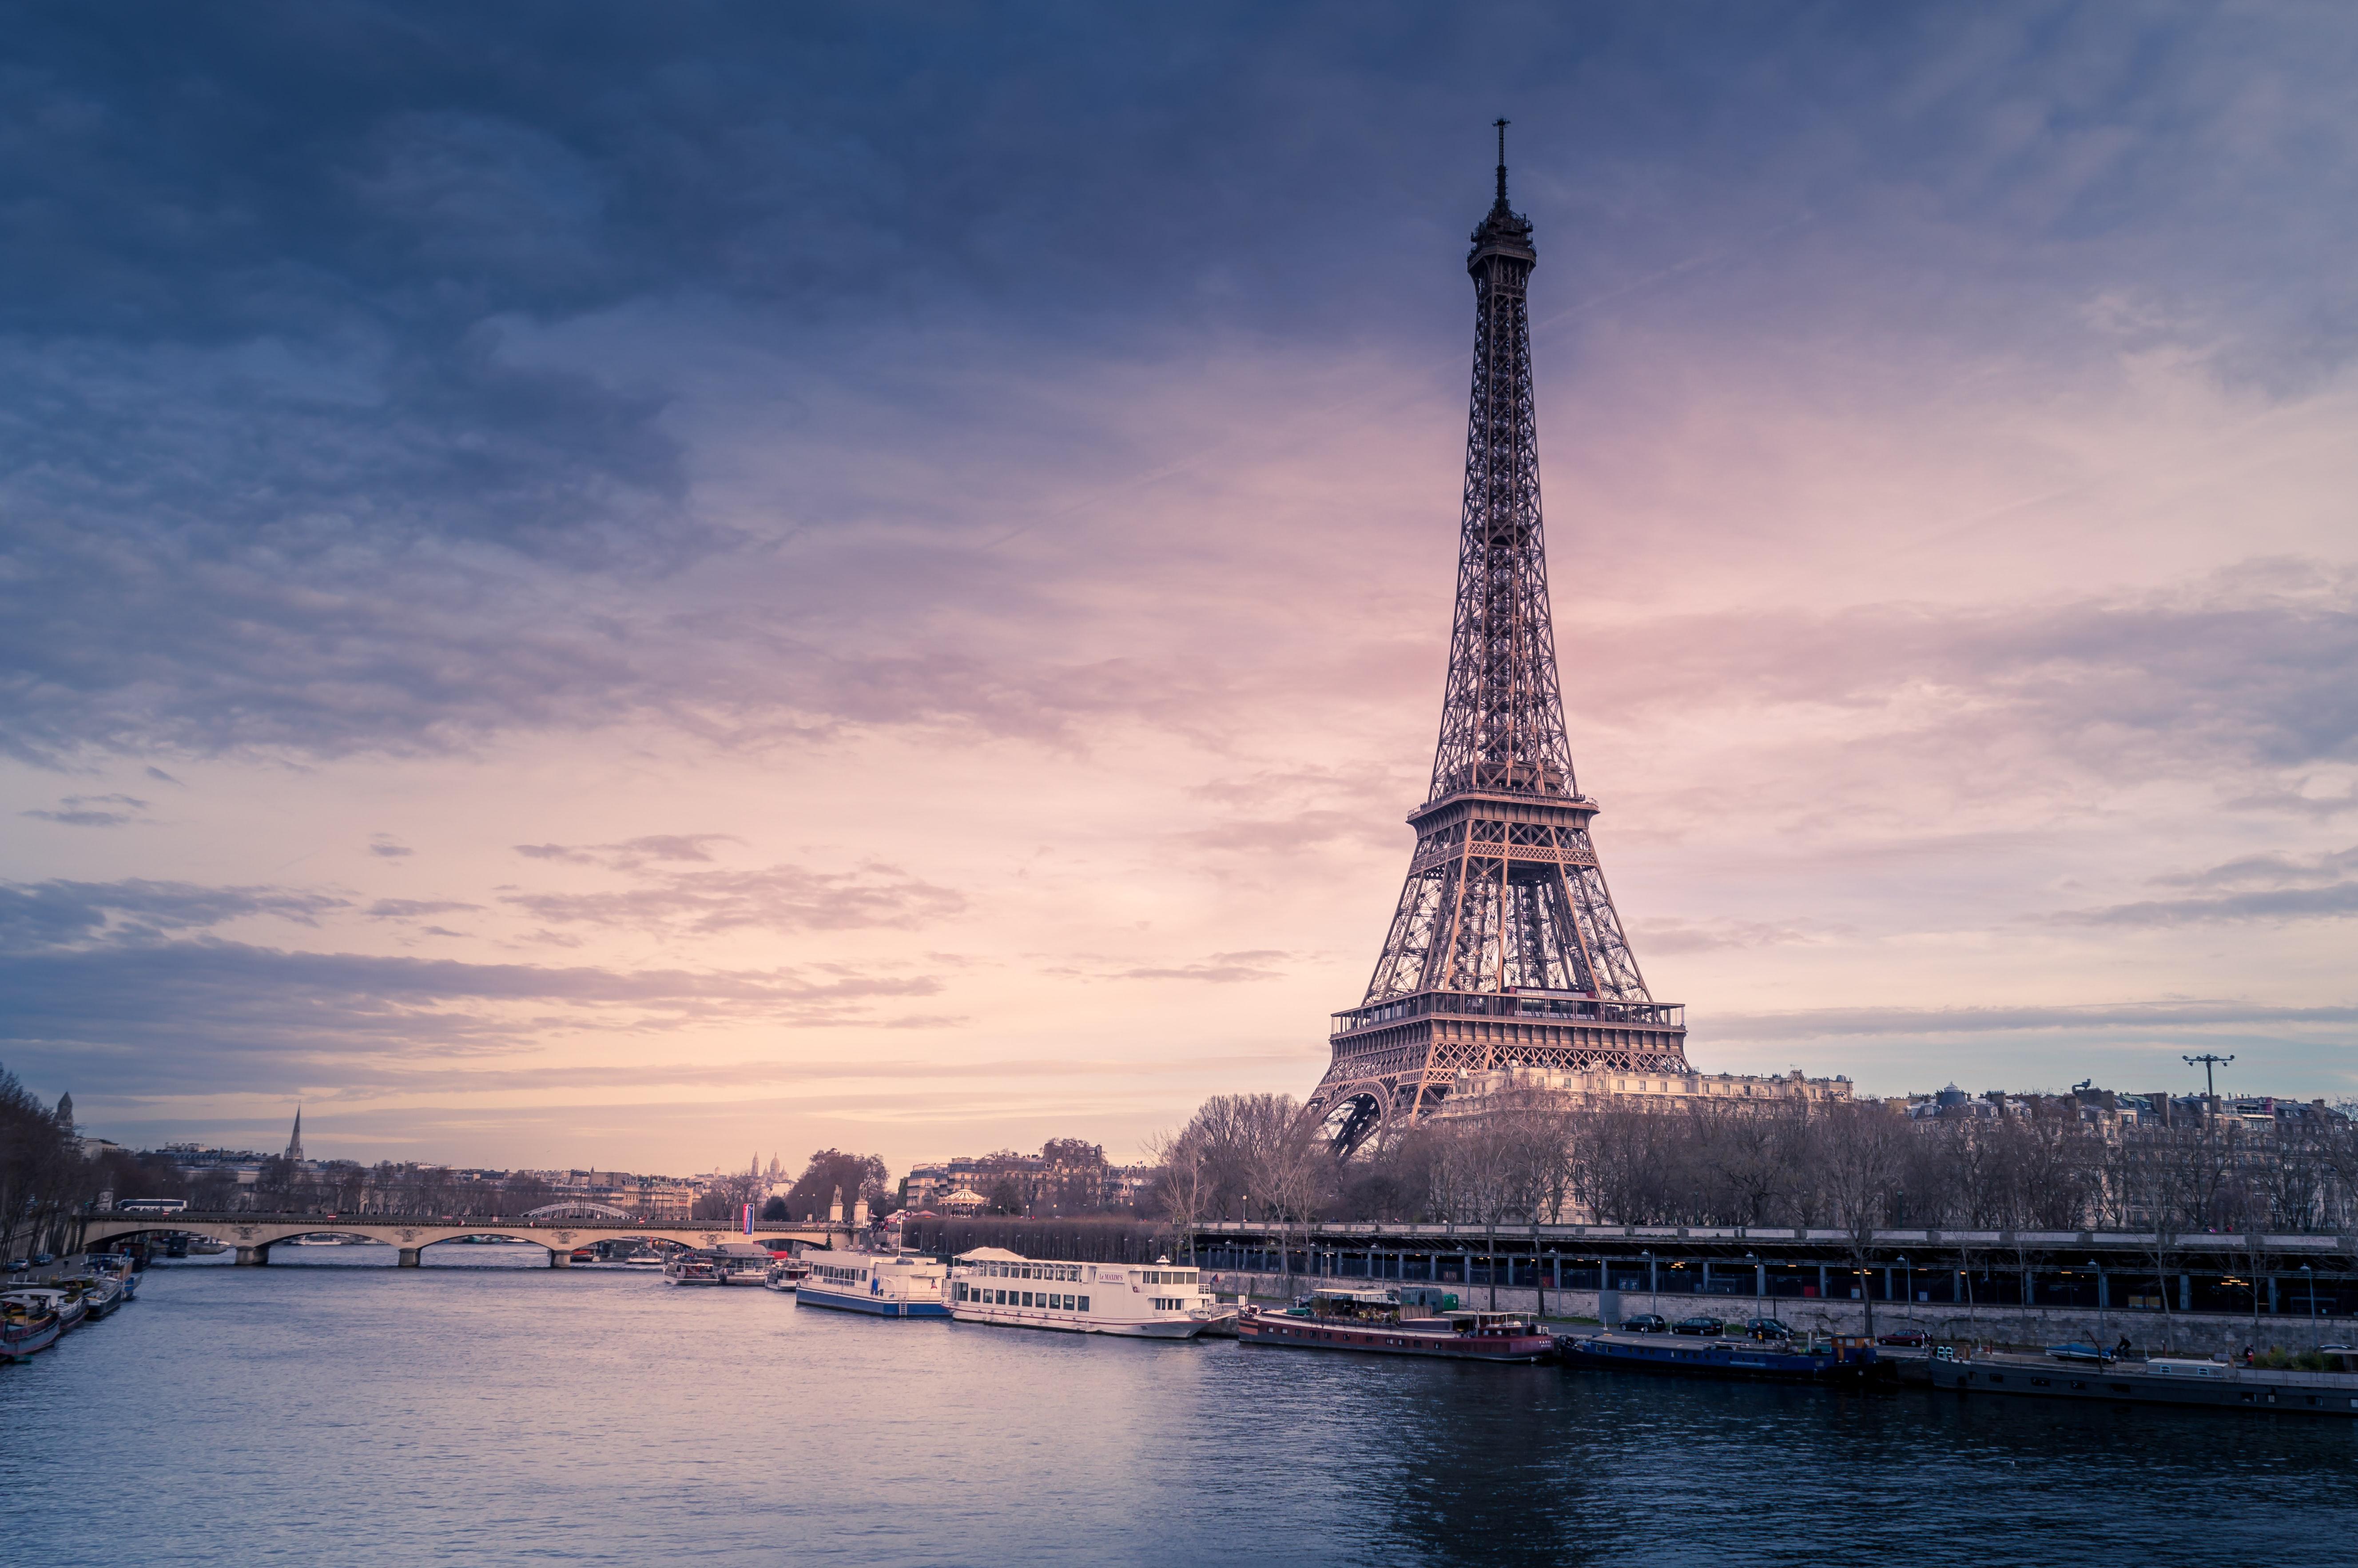 Paris, France in June